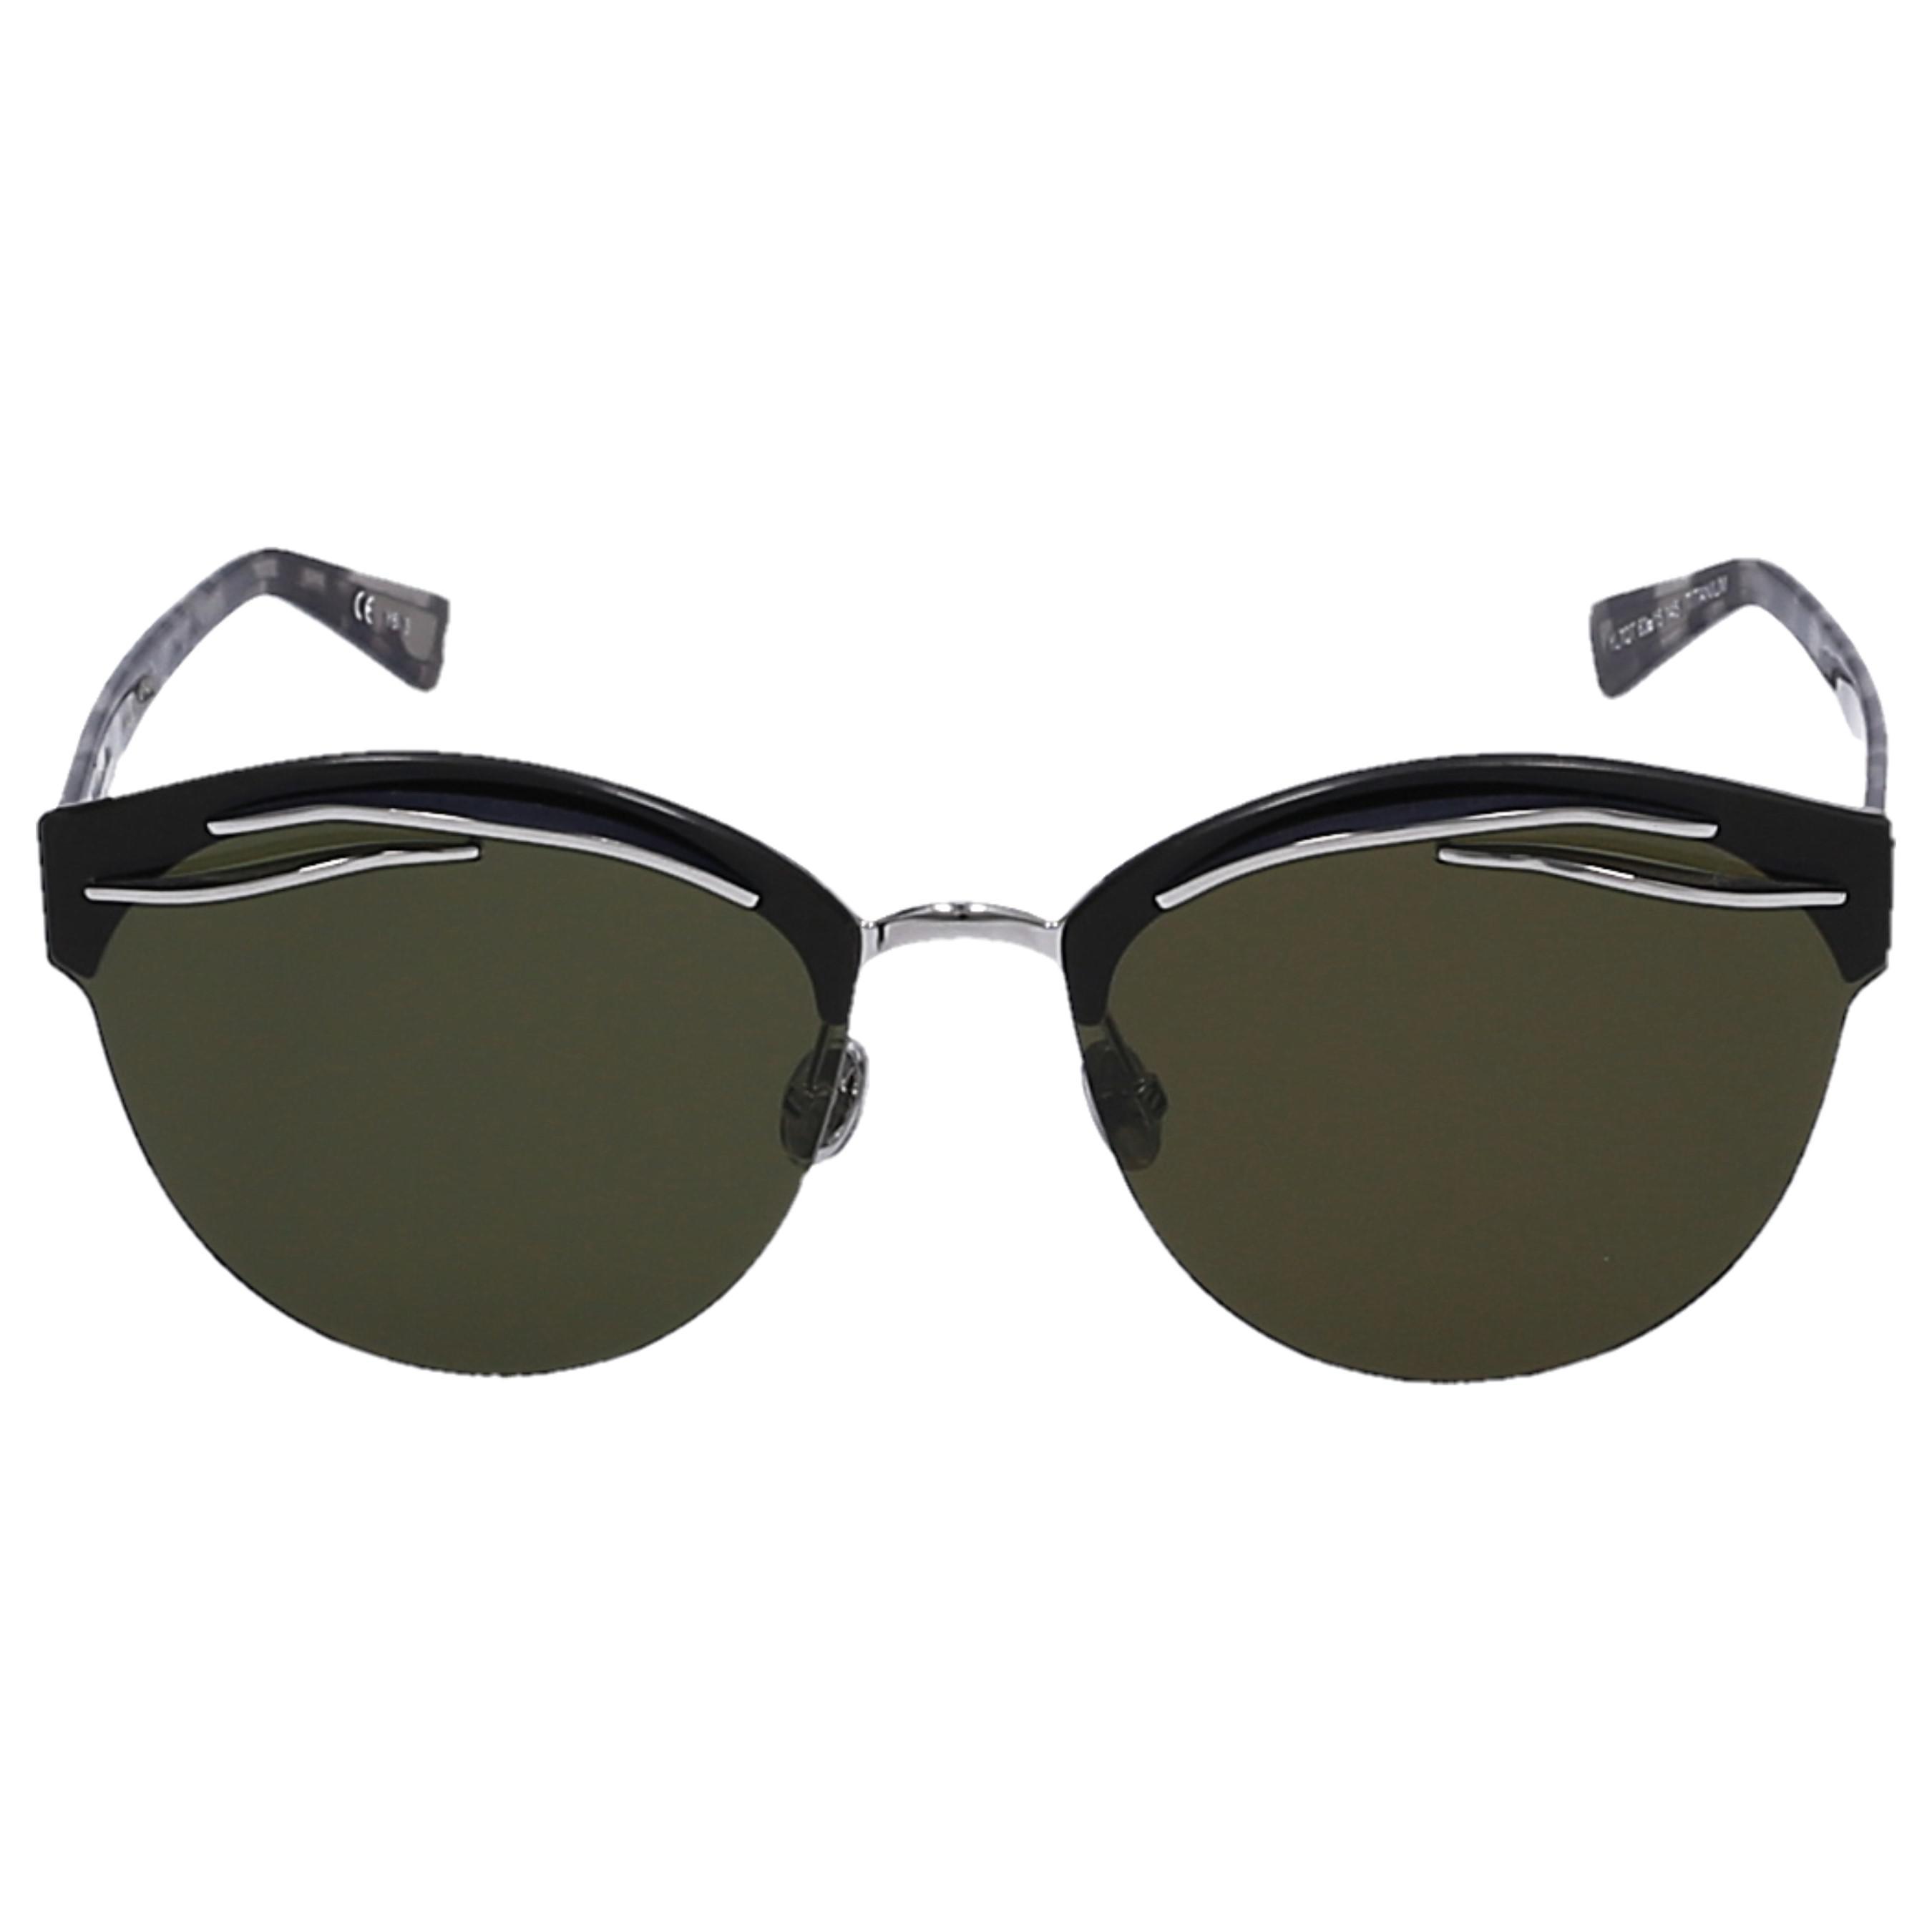 7339955c9427 Dior Sunglasses Cat Eye Emperis Acetate Turtoise Green - Lyst